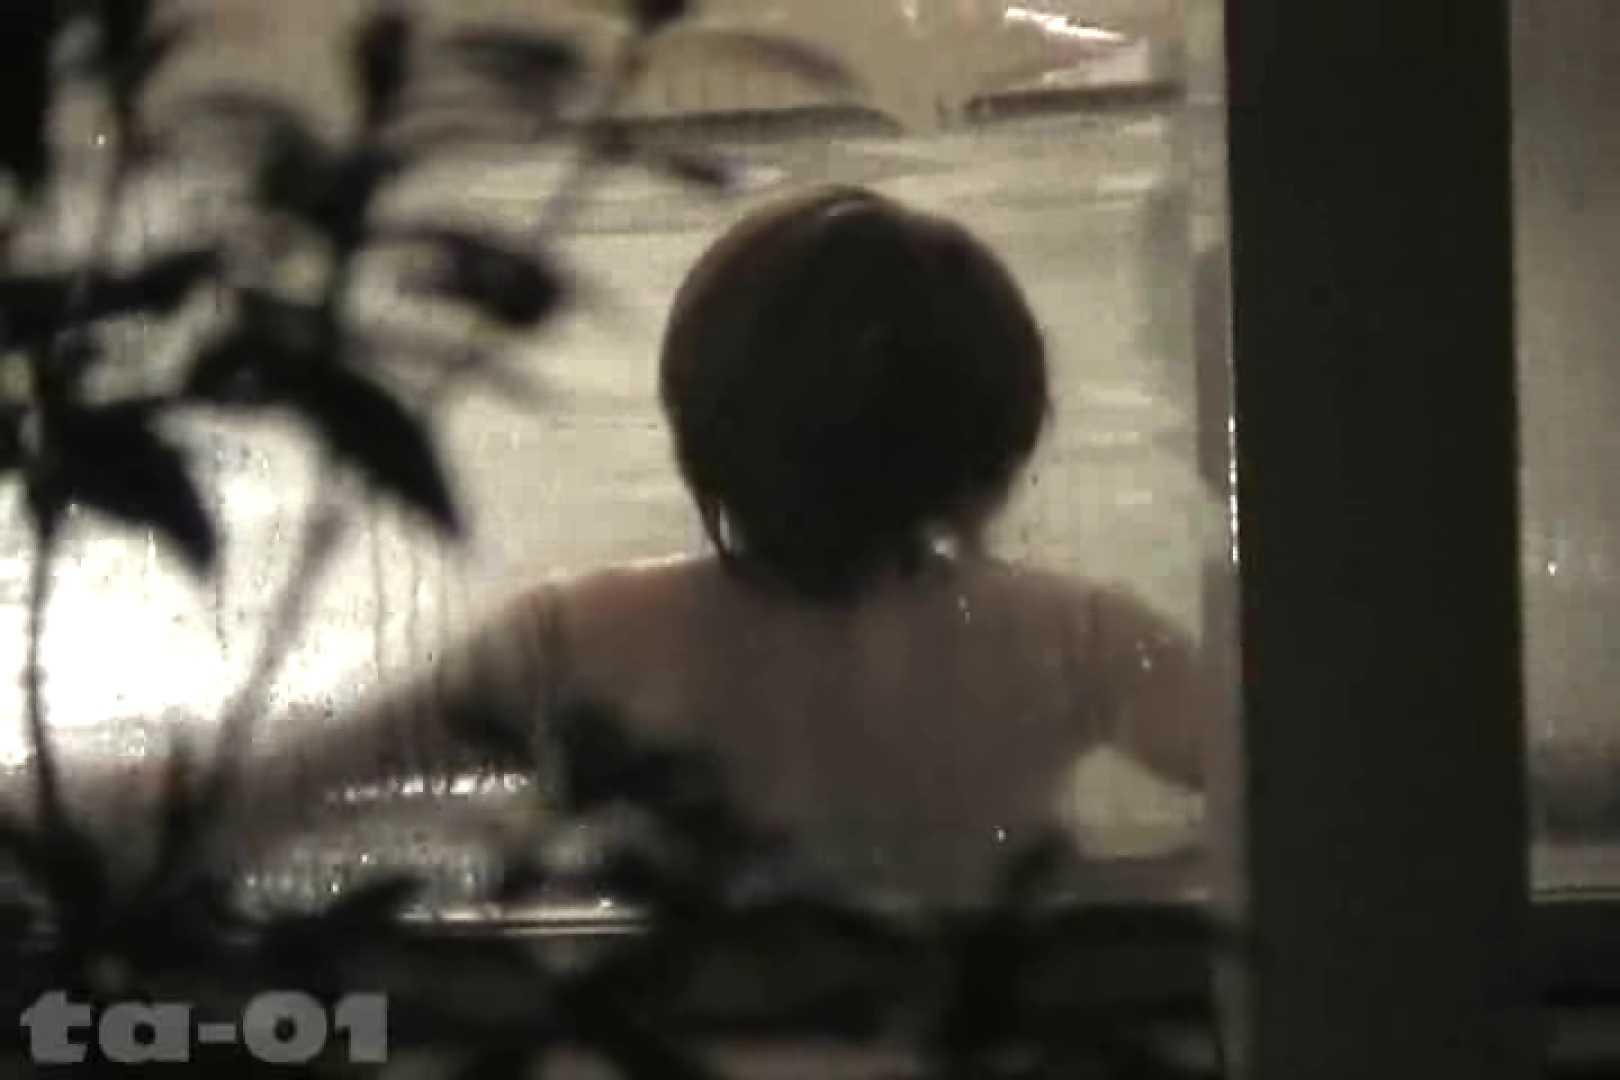 合宿ホテル女風呂盗撮高画質版 Vol.01 高画質動画  106画像 50